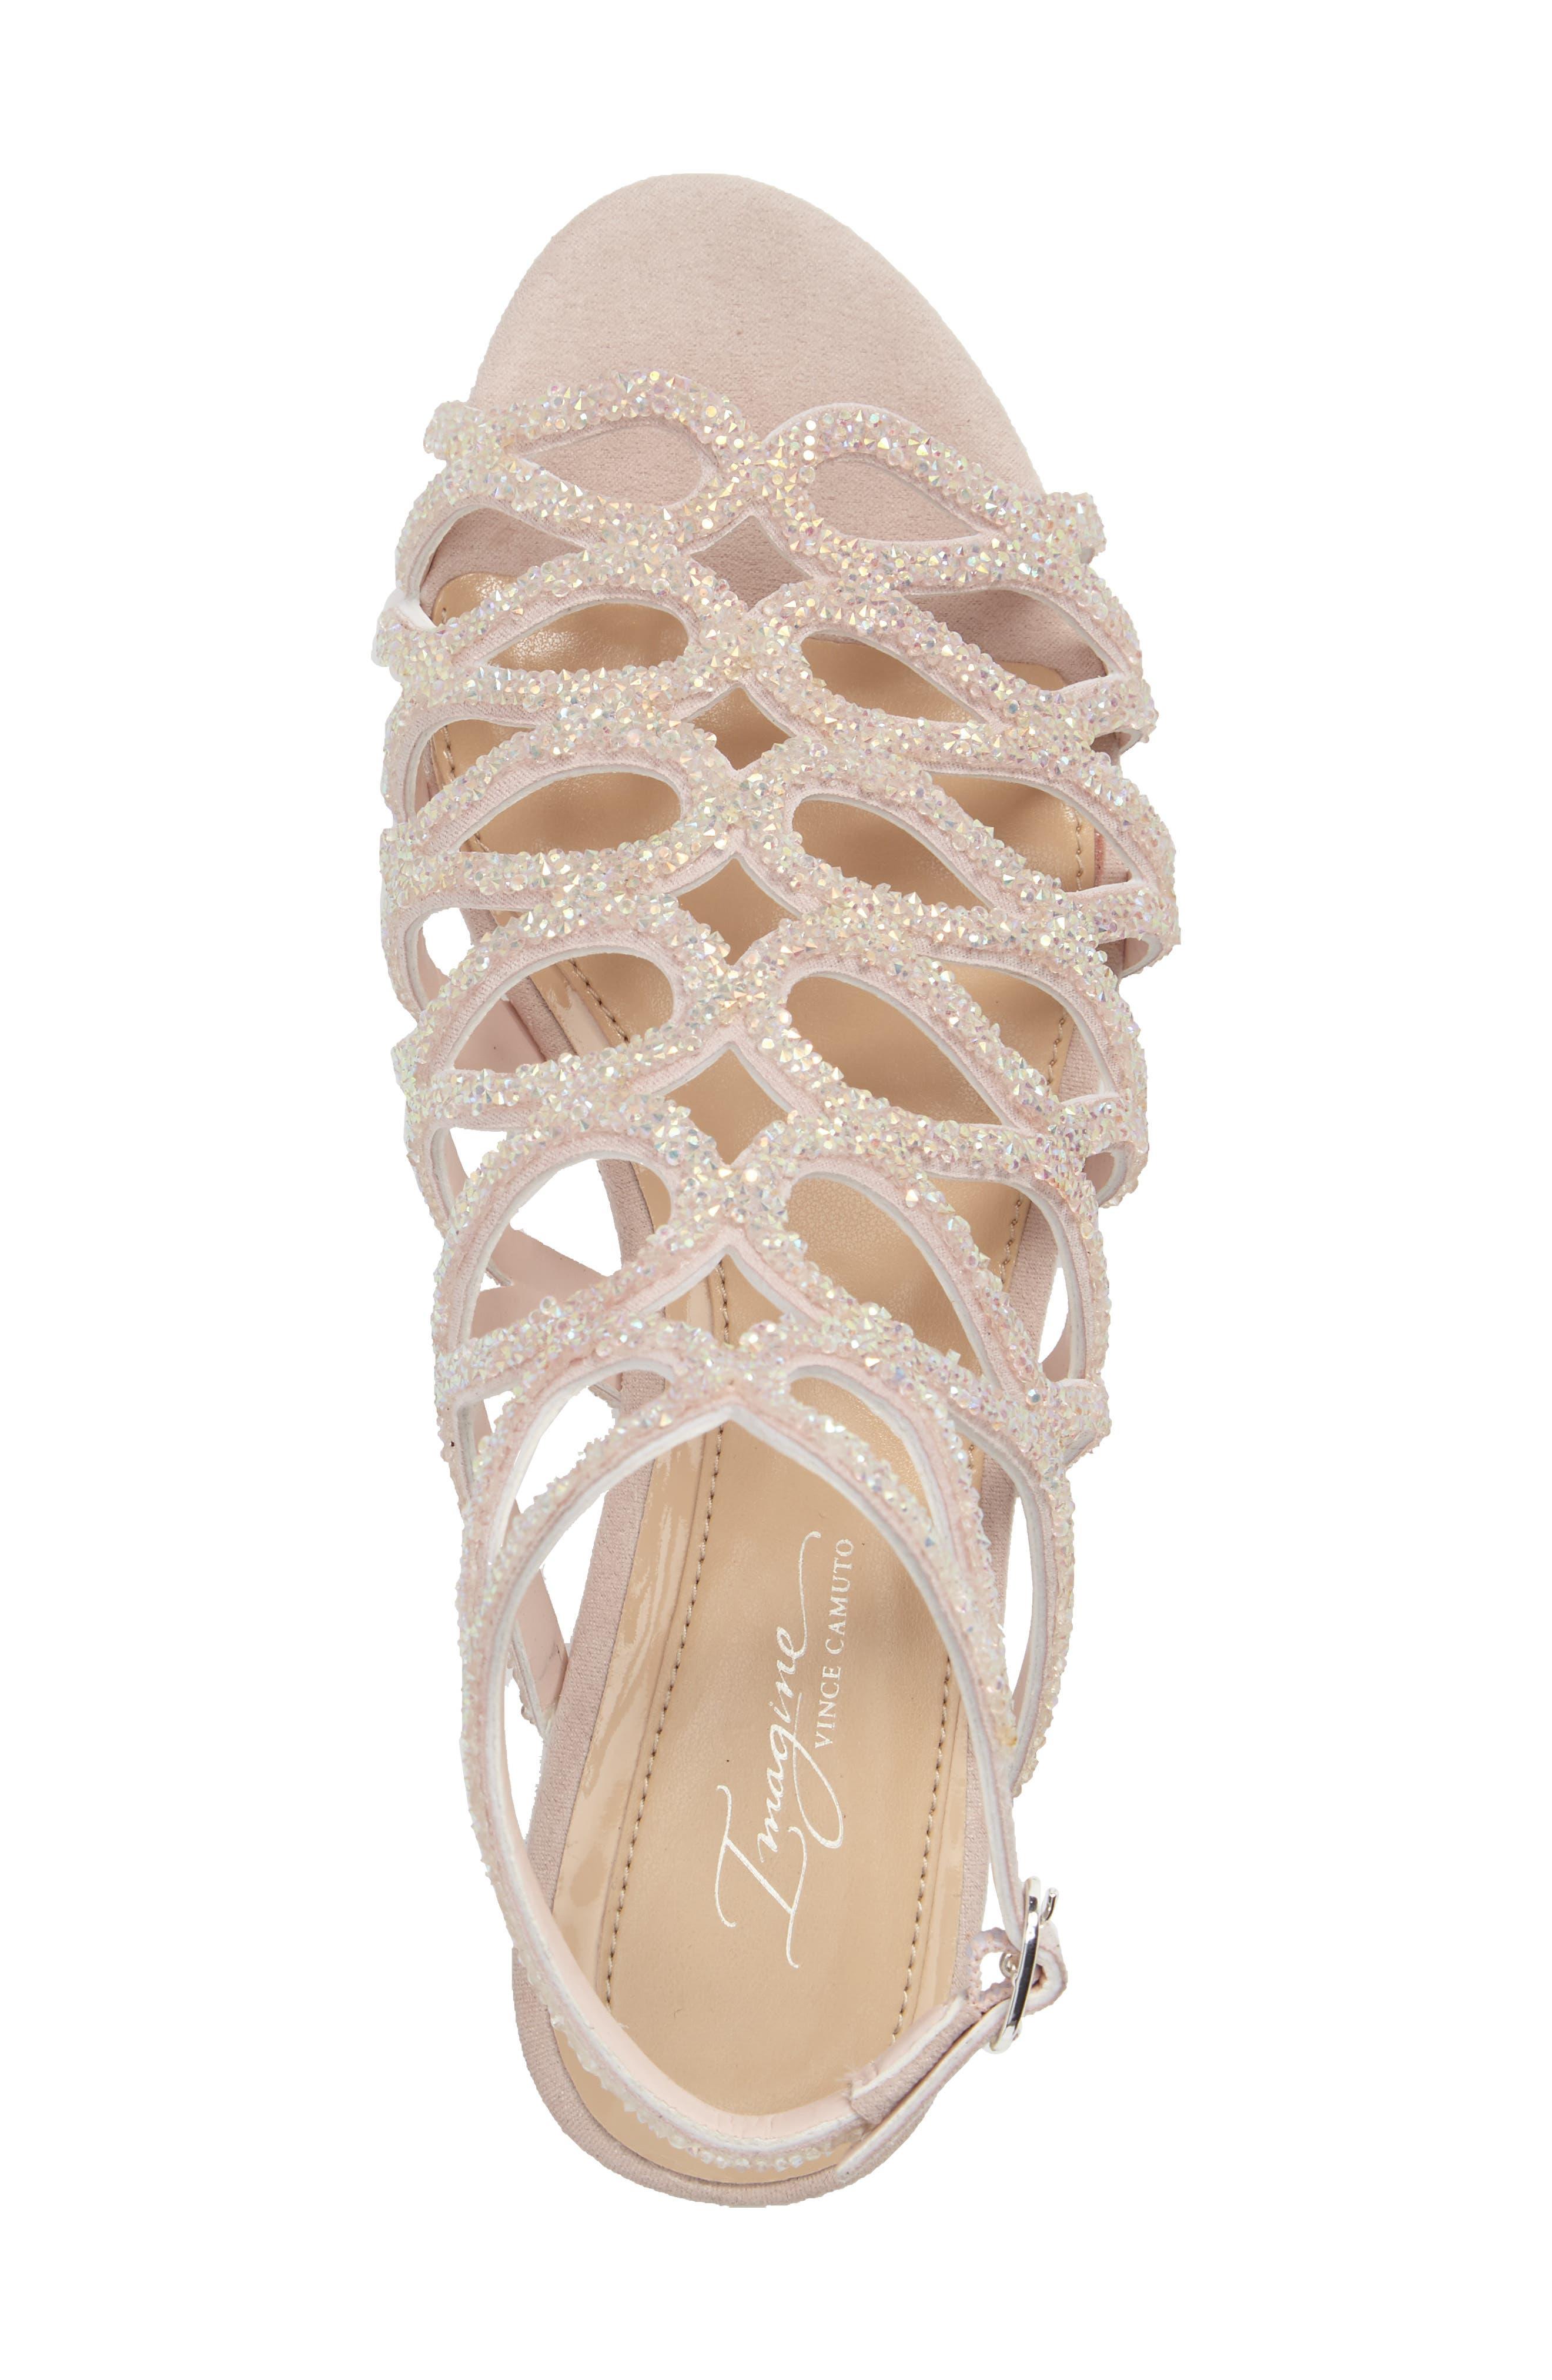 Ralee Glitter Sandal,                             Alternate thumbnail 3, color,                             Iridescent Pink Satin